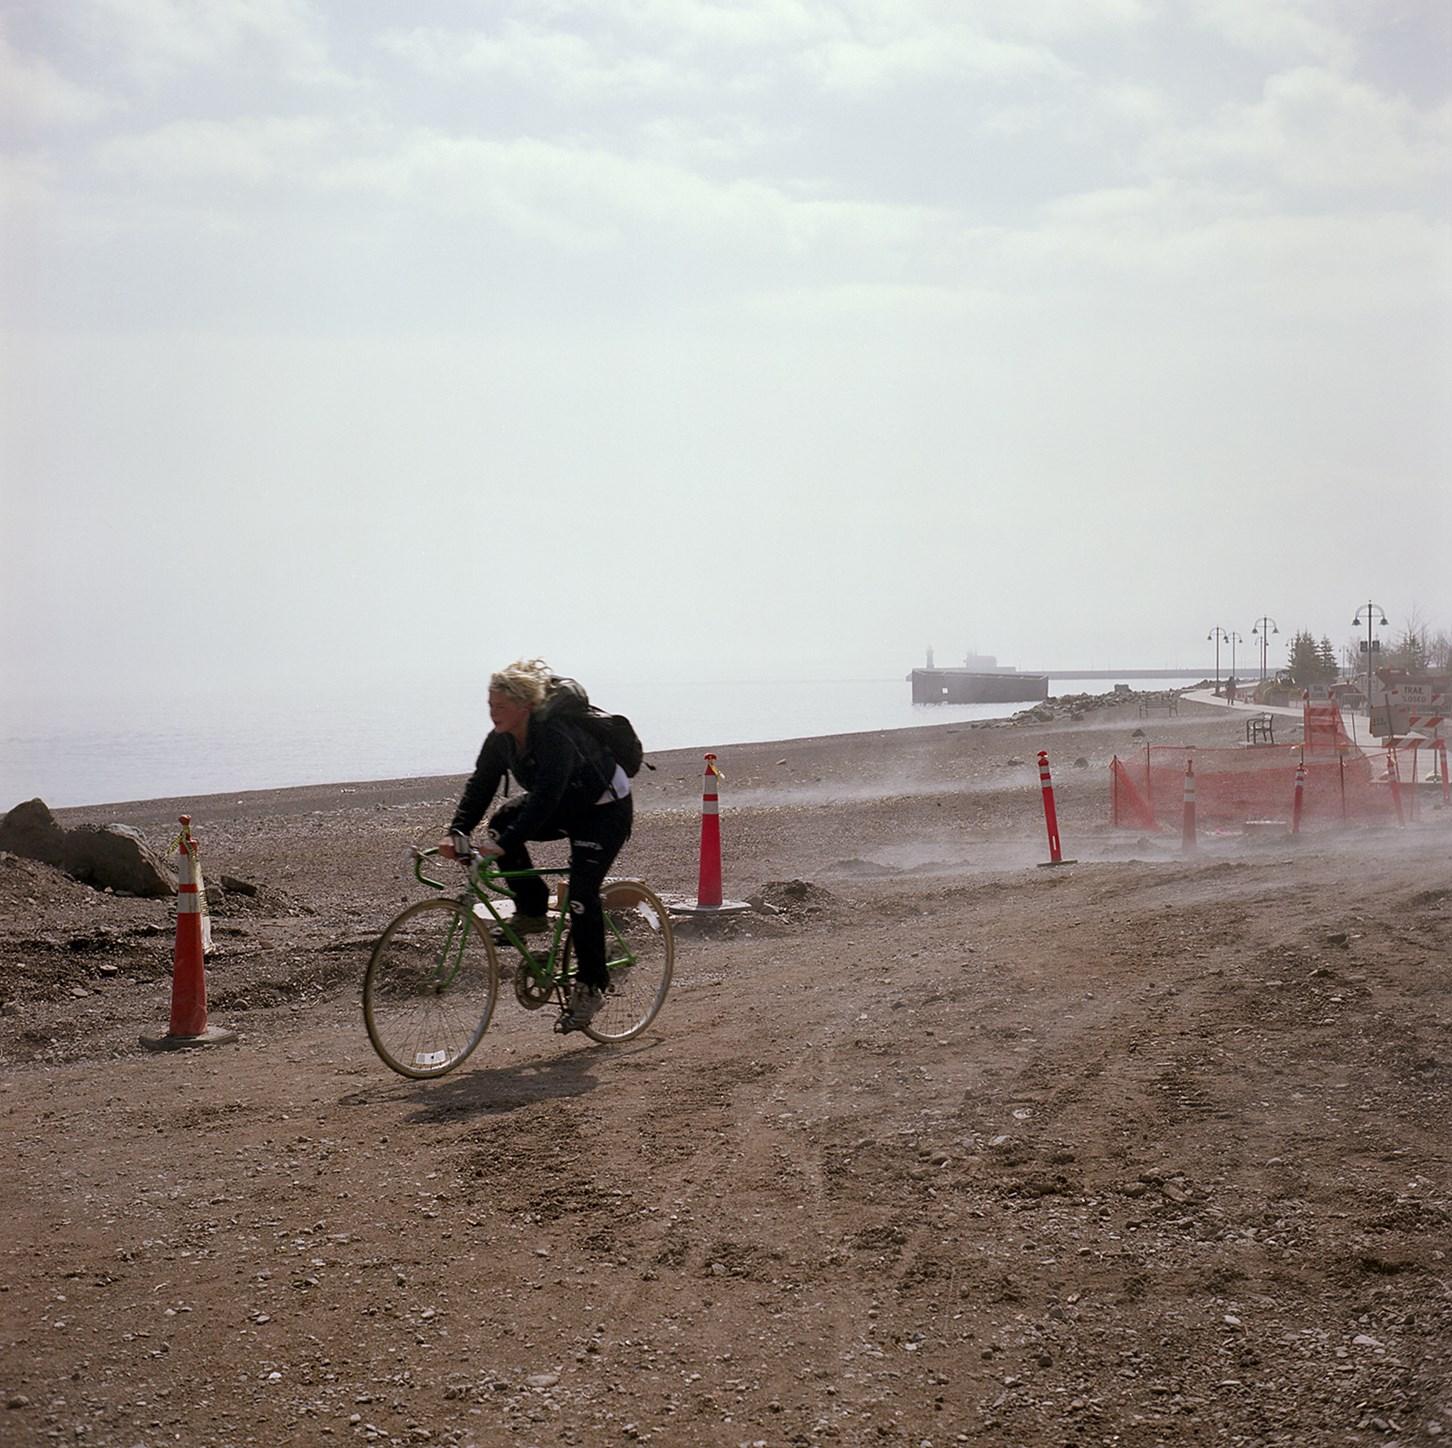 Bicyclist On The Lakewalk, Duluth, Minnesota, April 2010